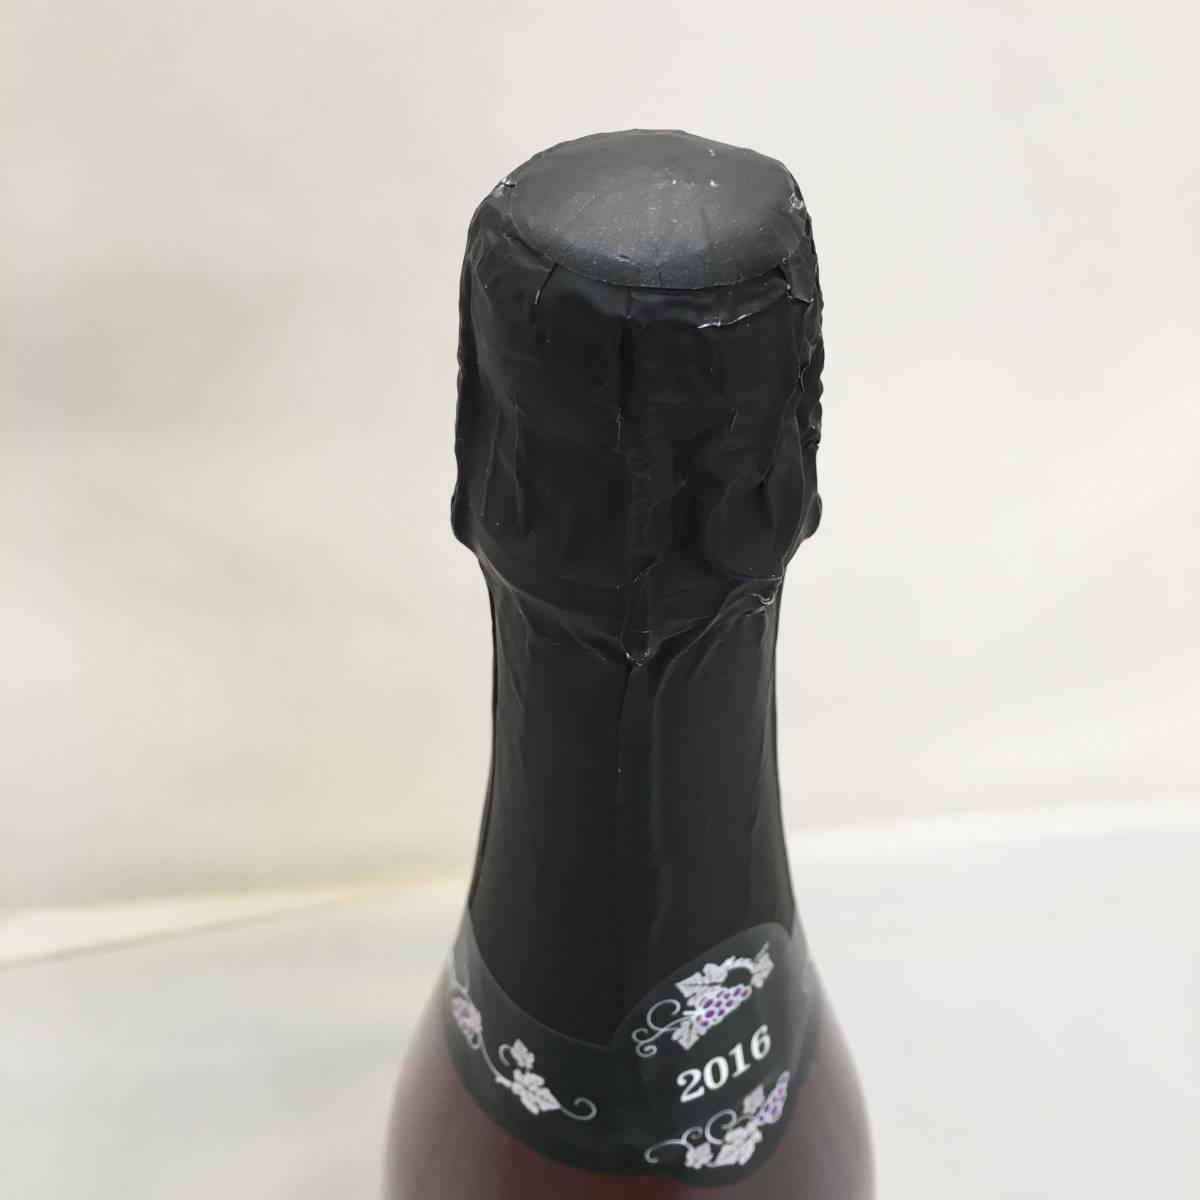 W180★【青森県在住の方限定】青森 ロゼスパークリングワイン 750ml 12%_画像3